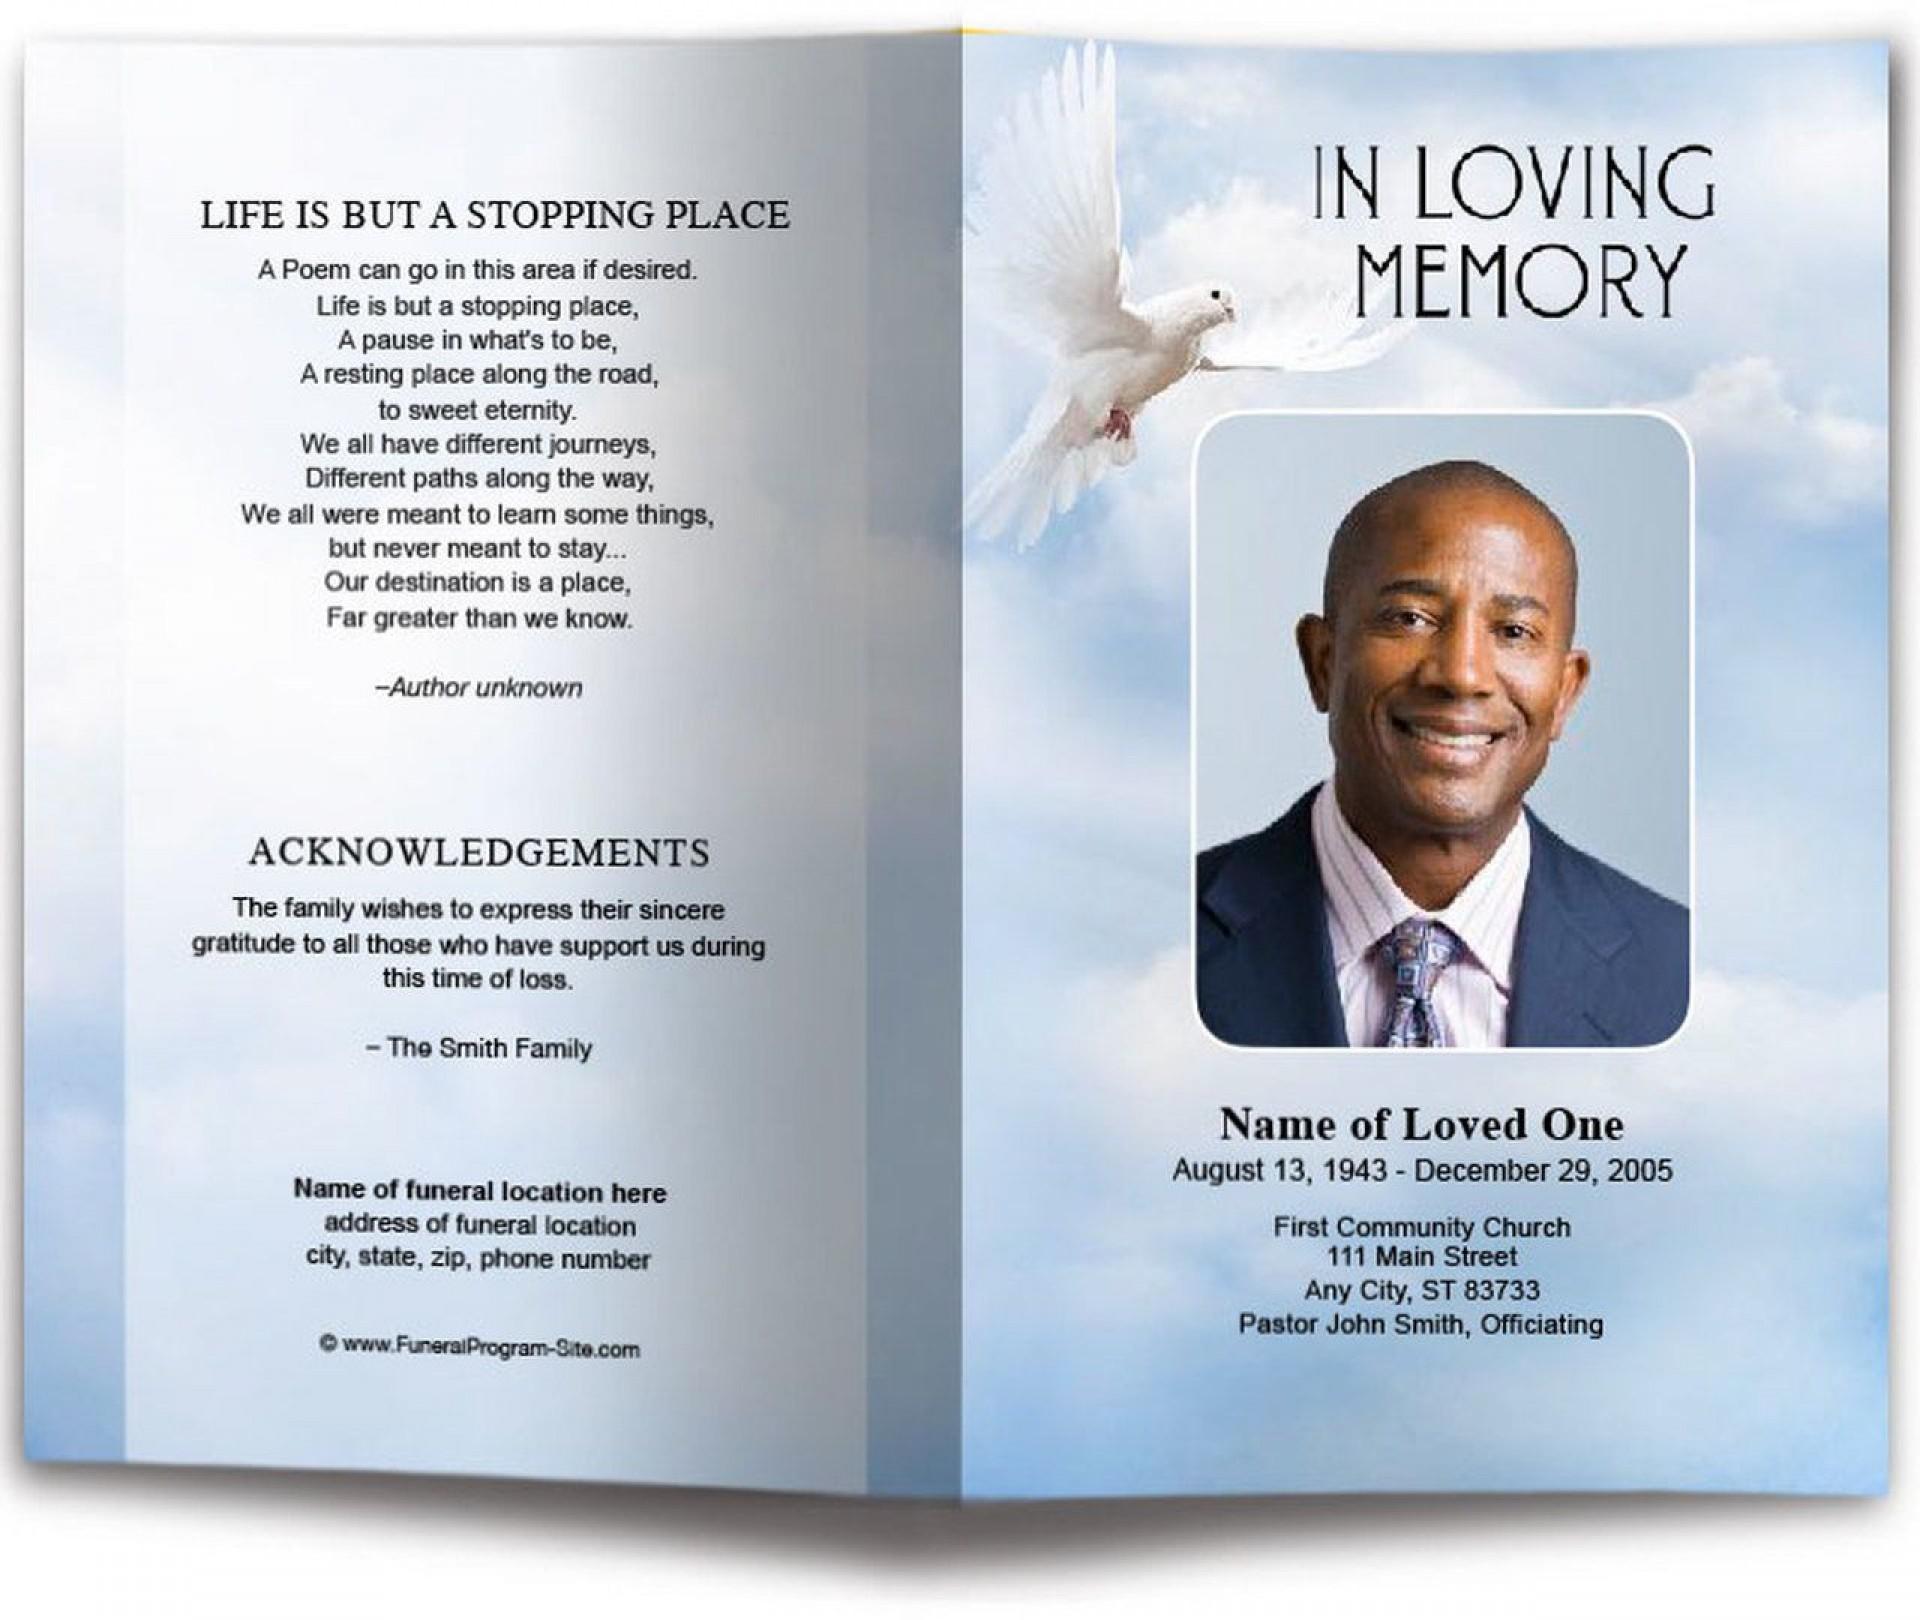 001 Incredible Free Funeral Program Template Photo  Word Catholic Editable Pdf1920